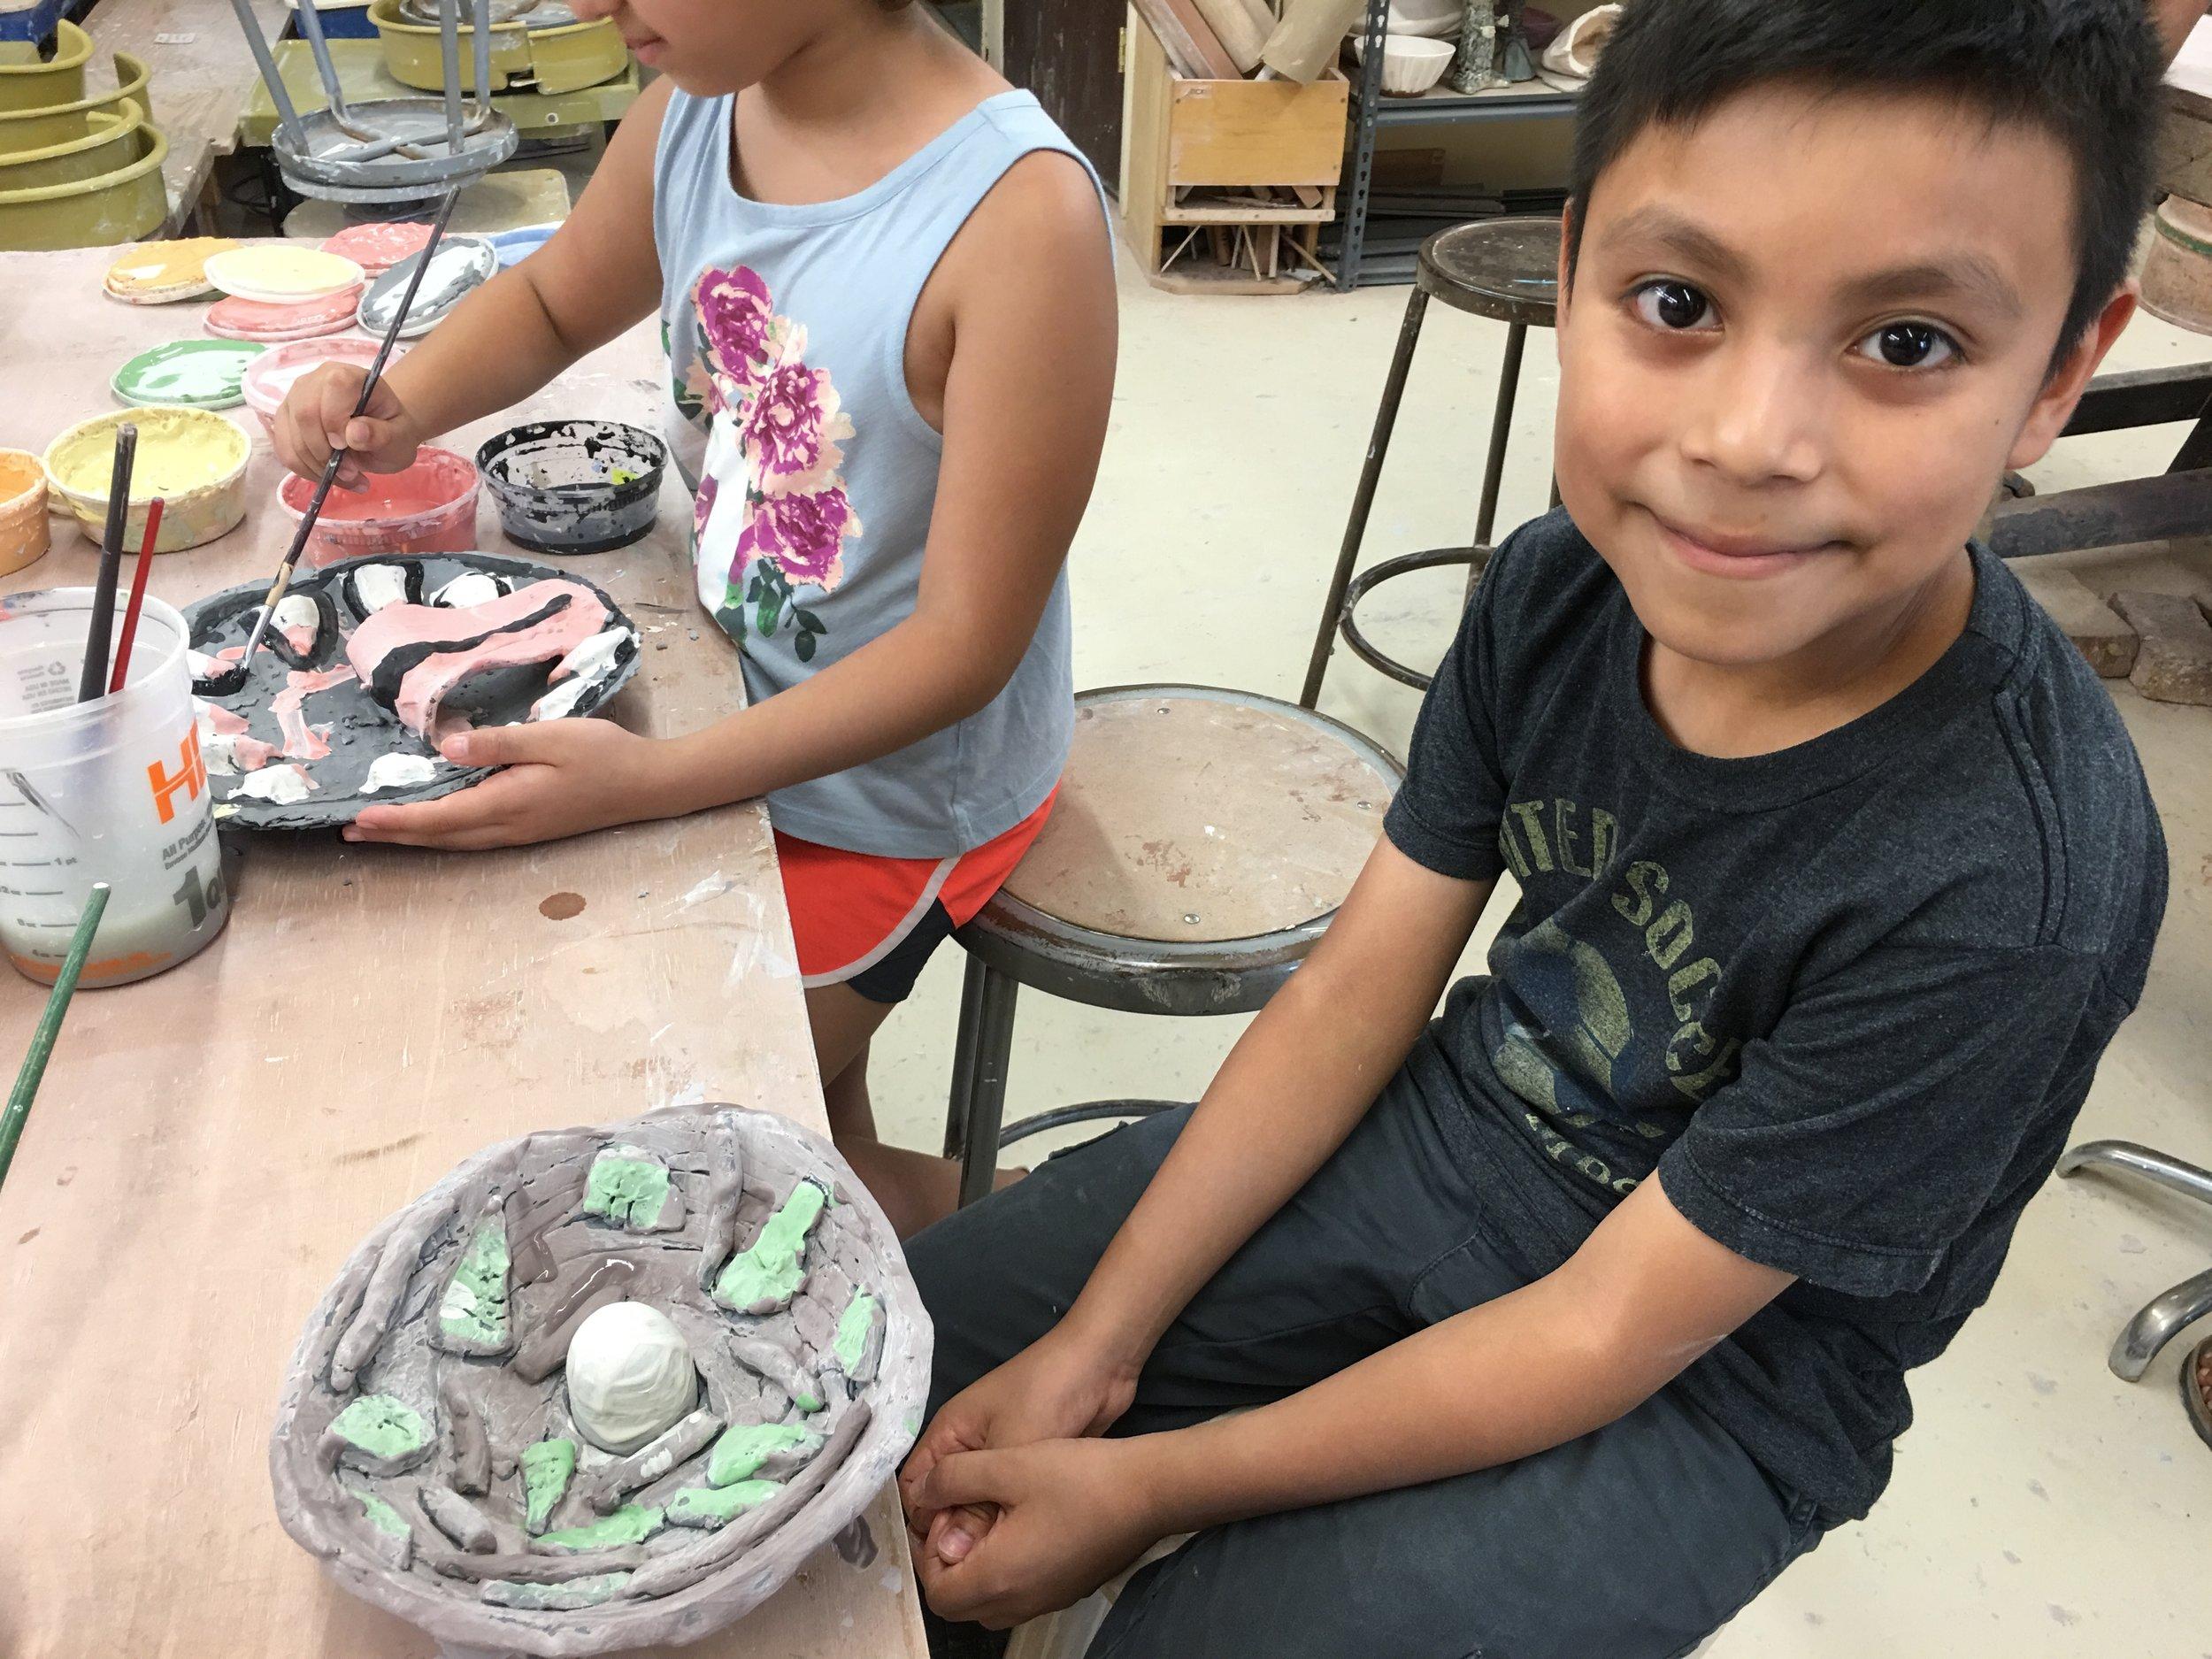 clay-art-center-kids-bring-change_28273915336_o.jpg